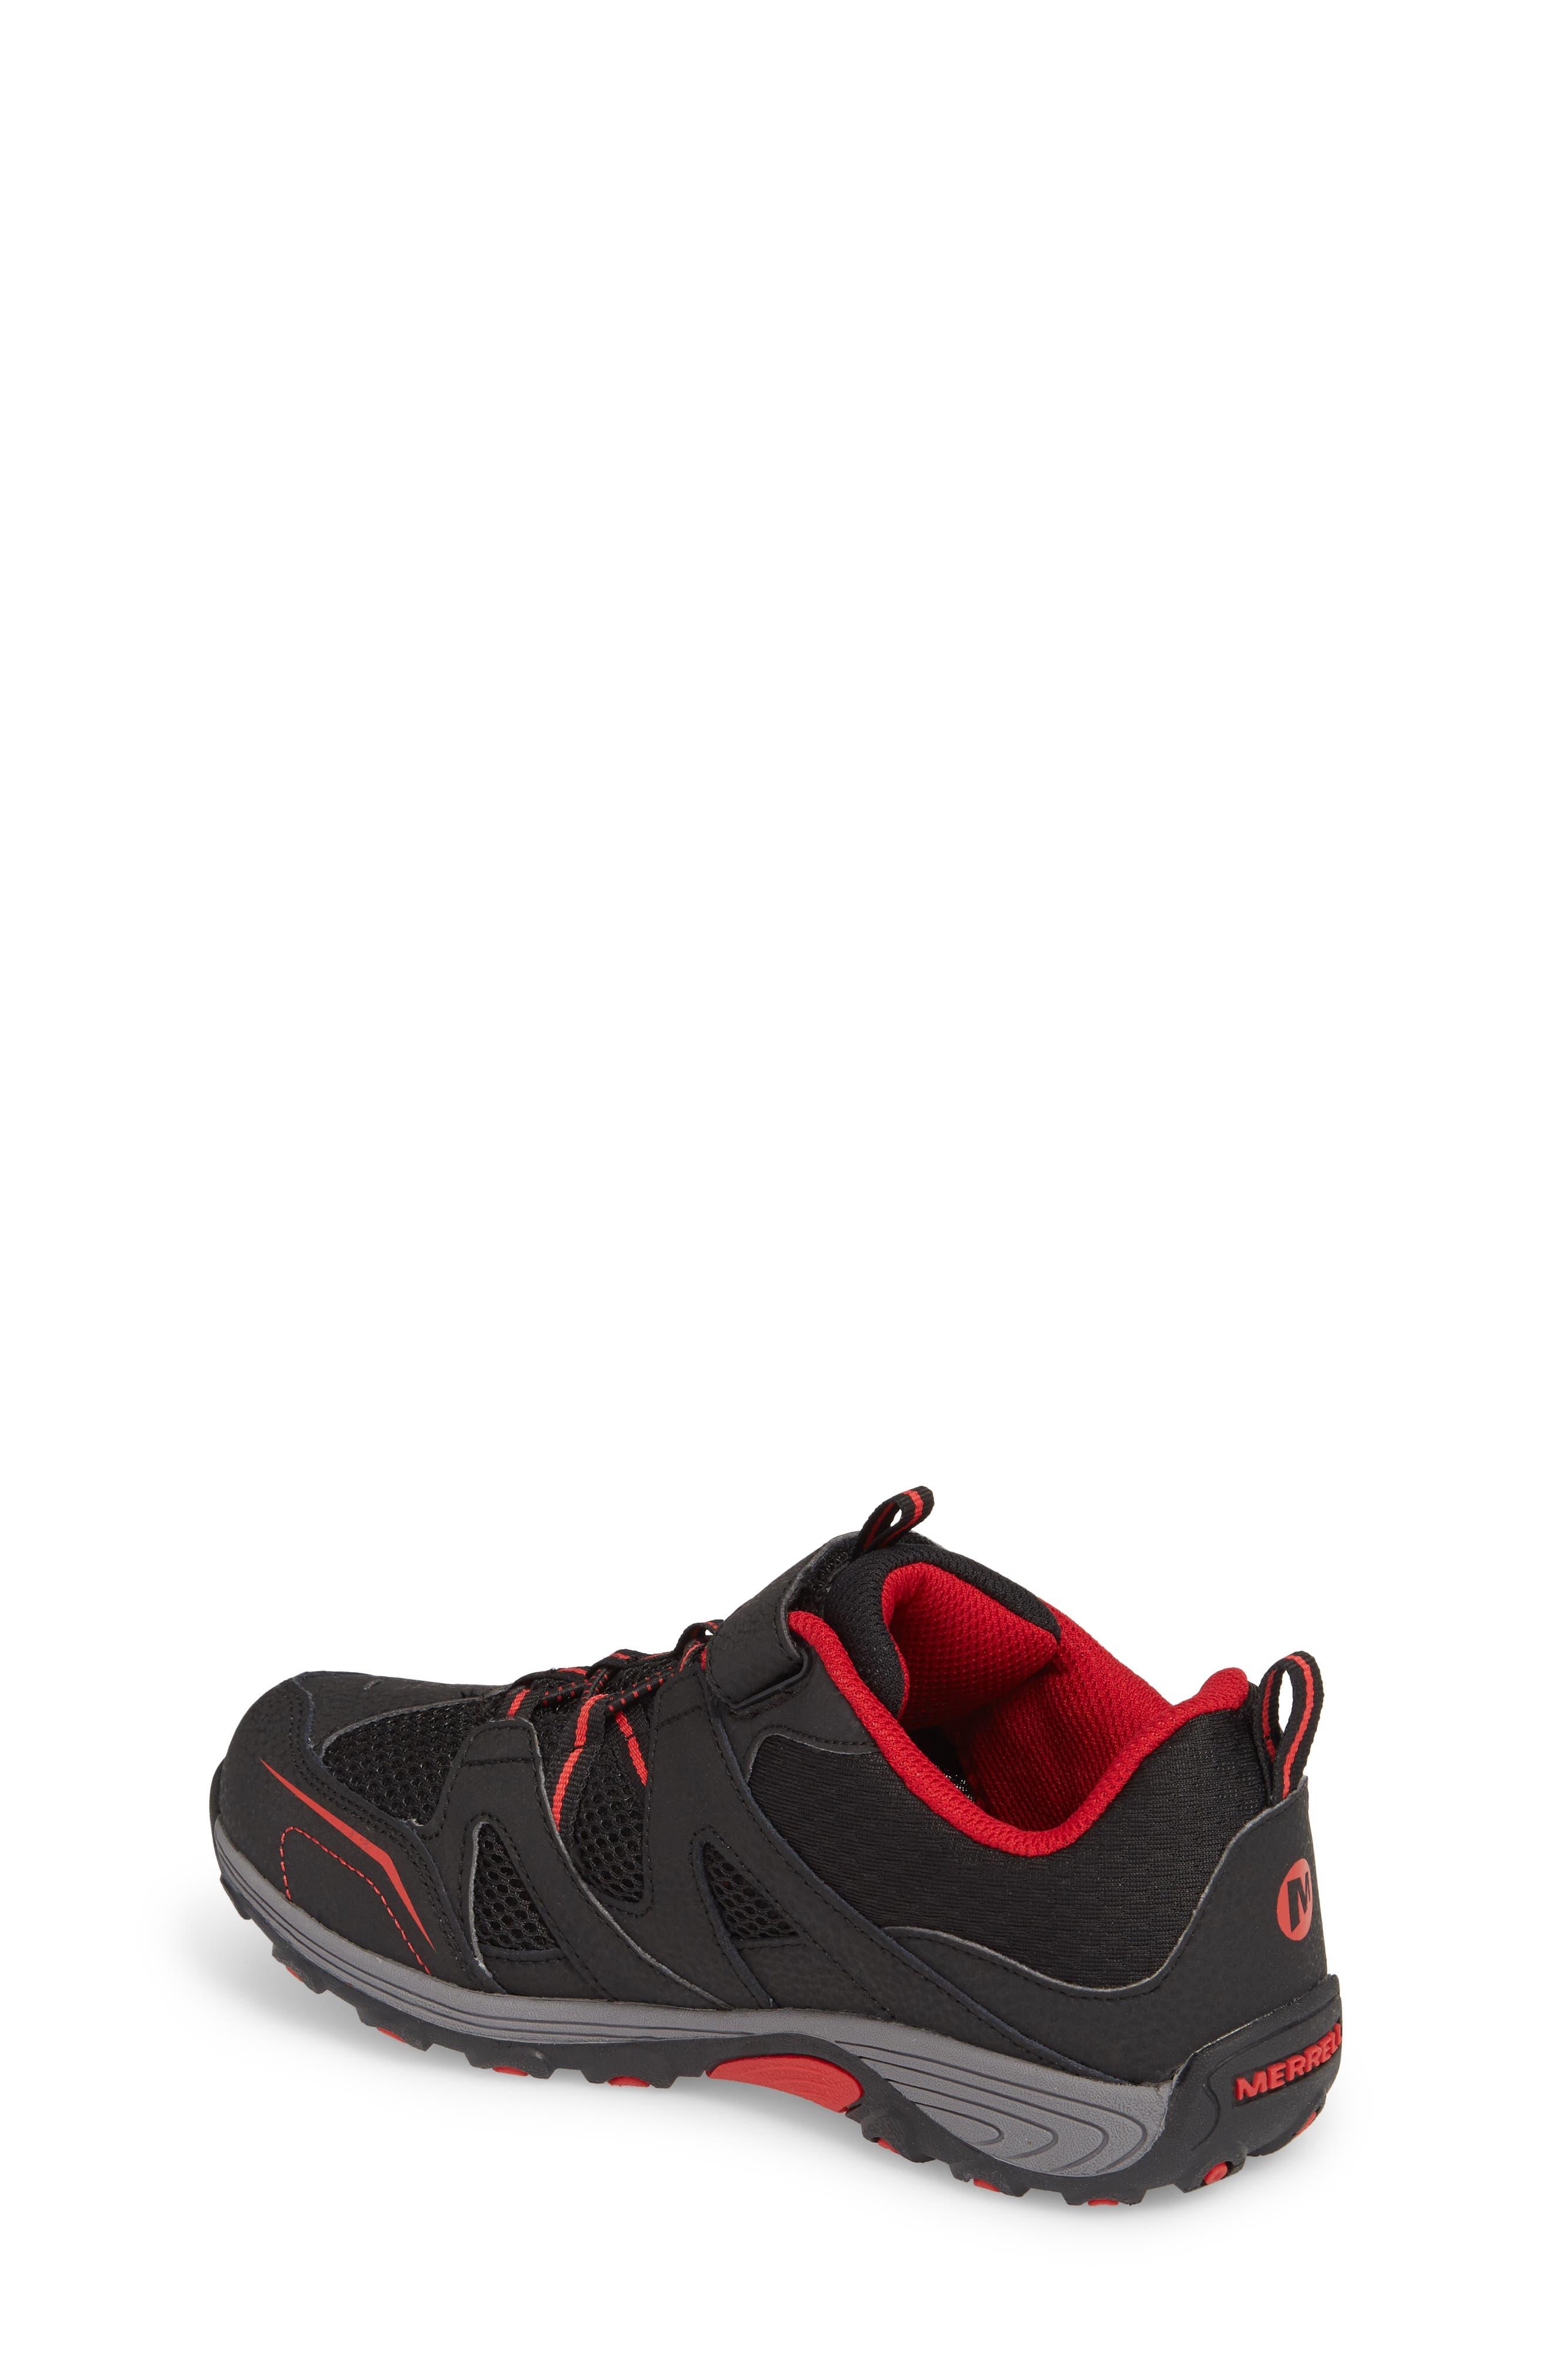 Trail Chaser Sneaker,                             Alternate thumbnail 2, color,                             Black/ Red